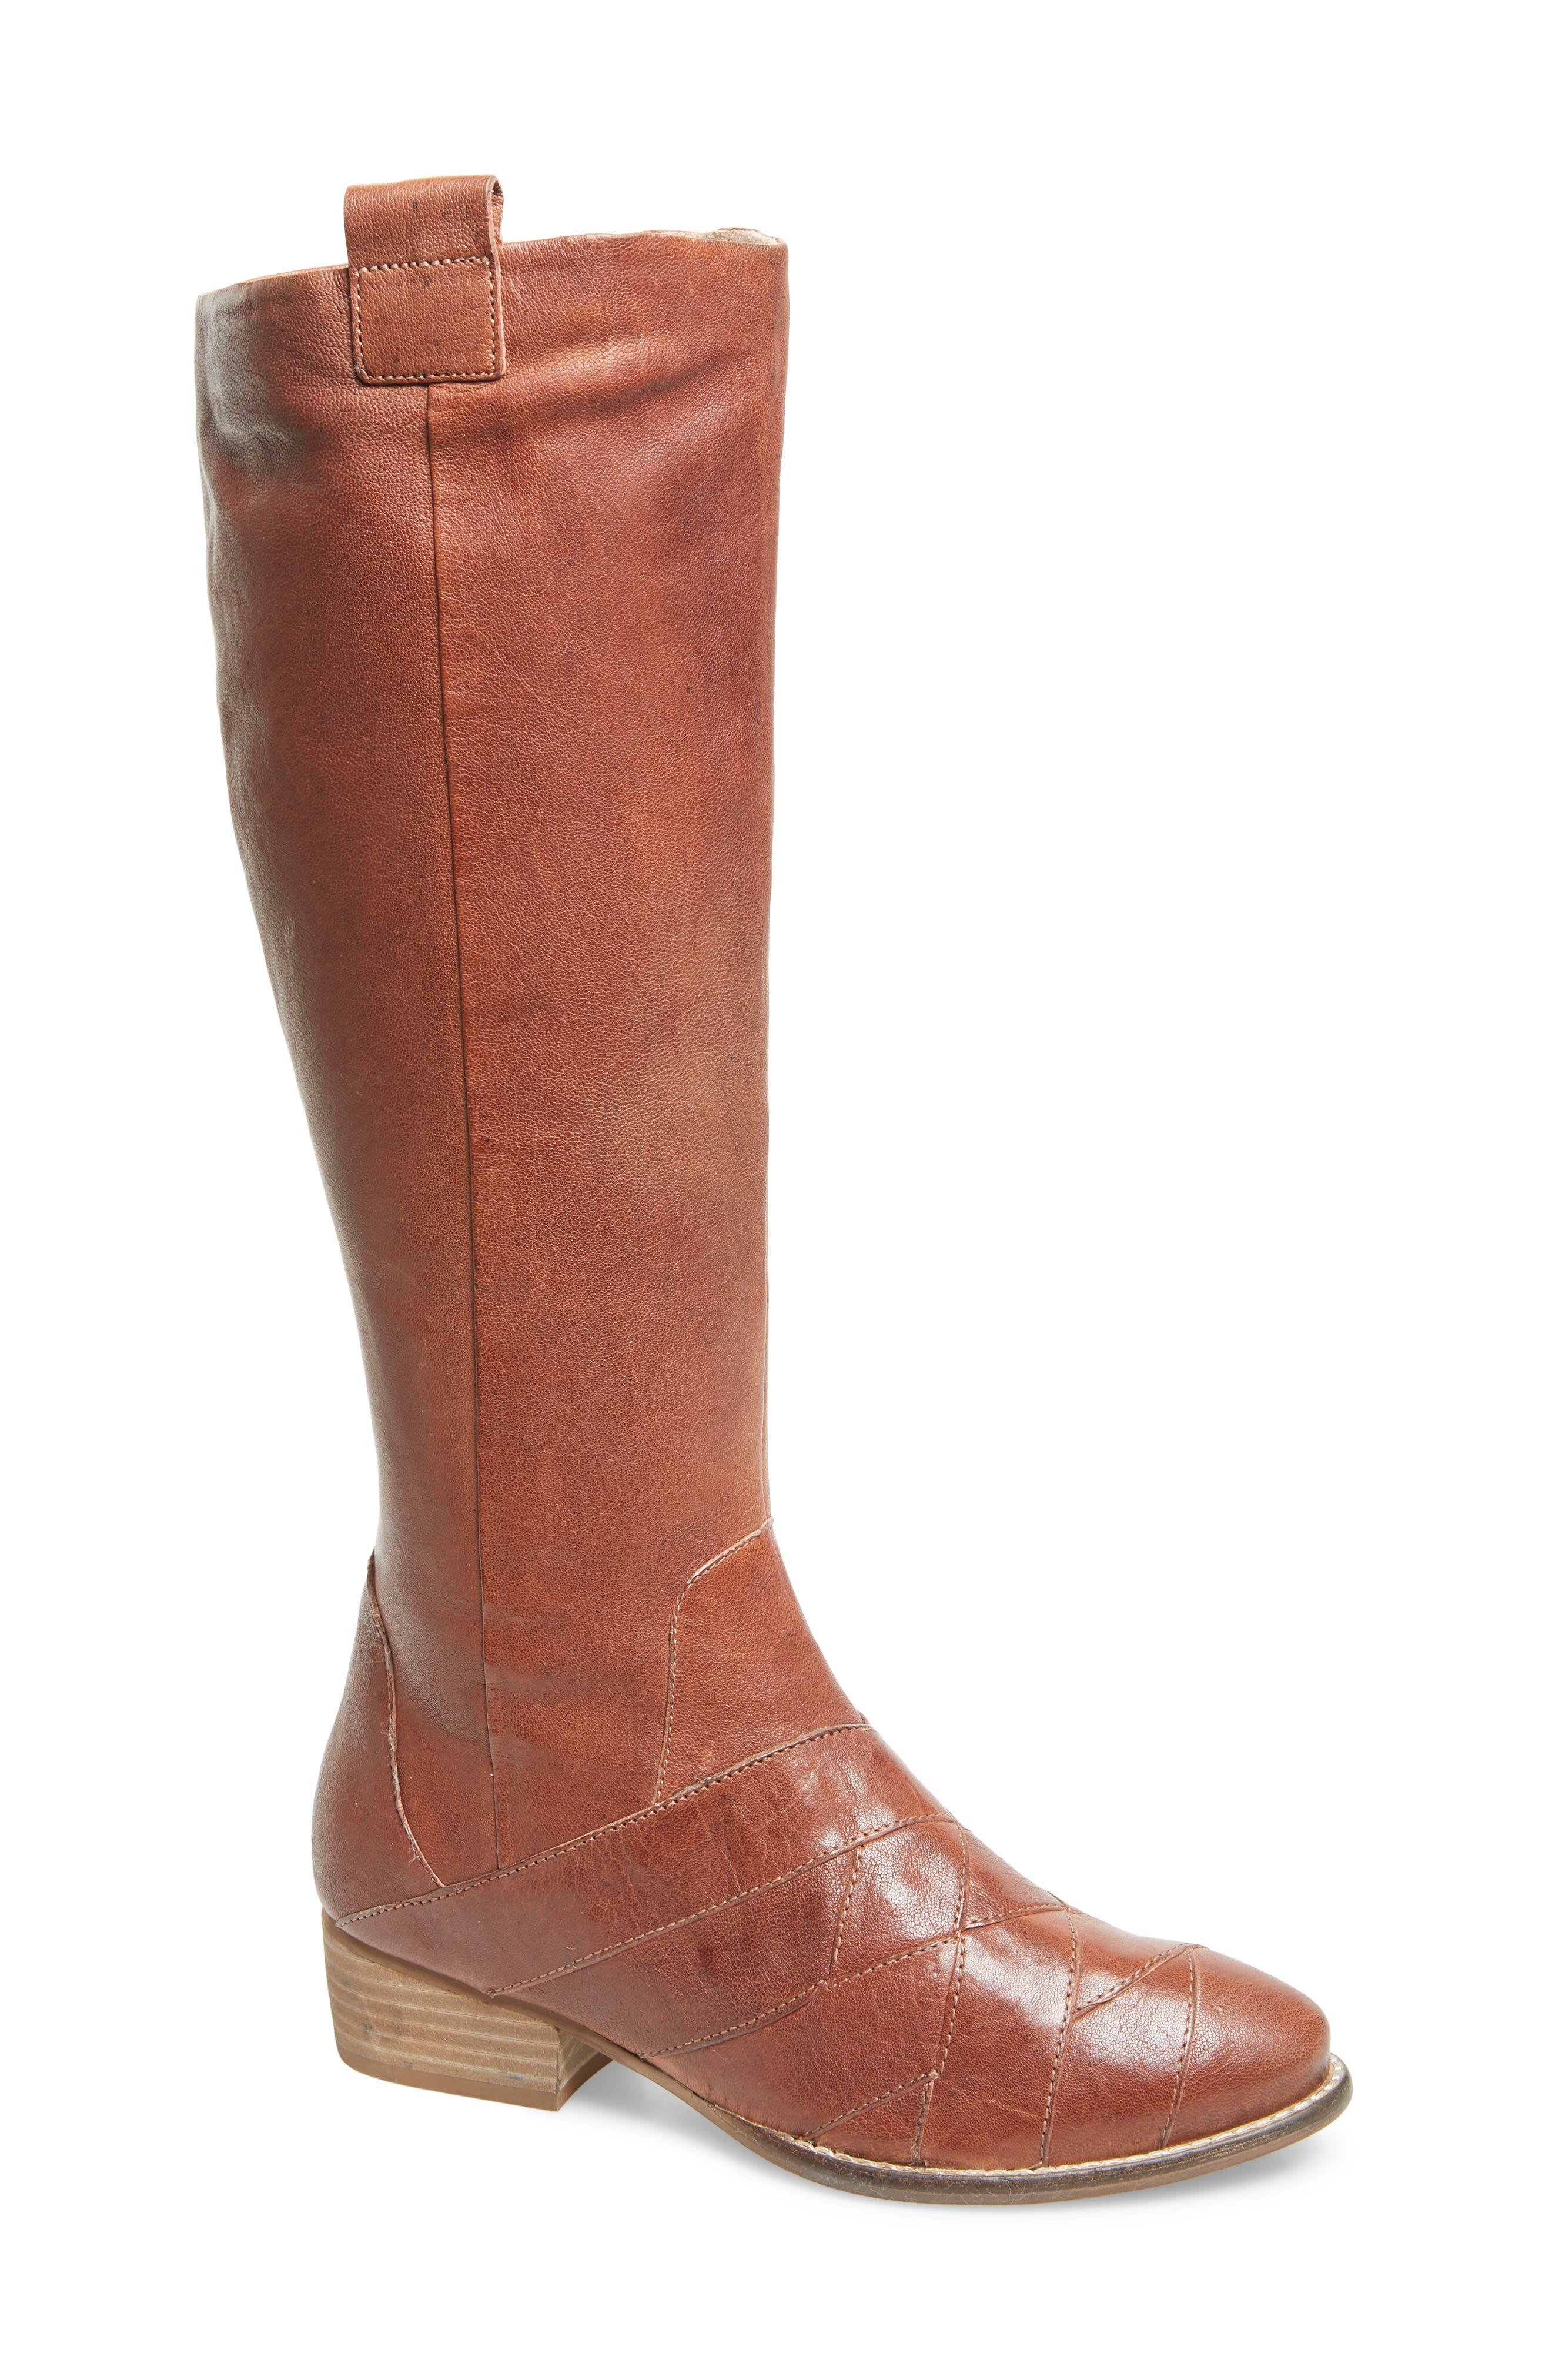 Seychelles Rally Knee High Boot- Brown